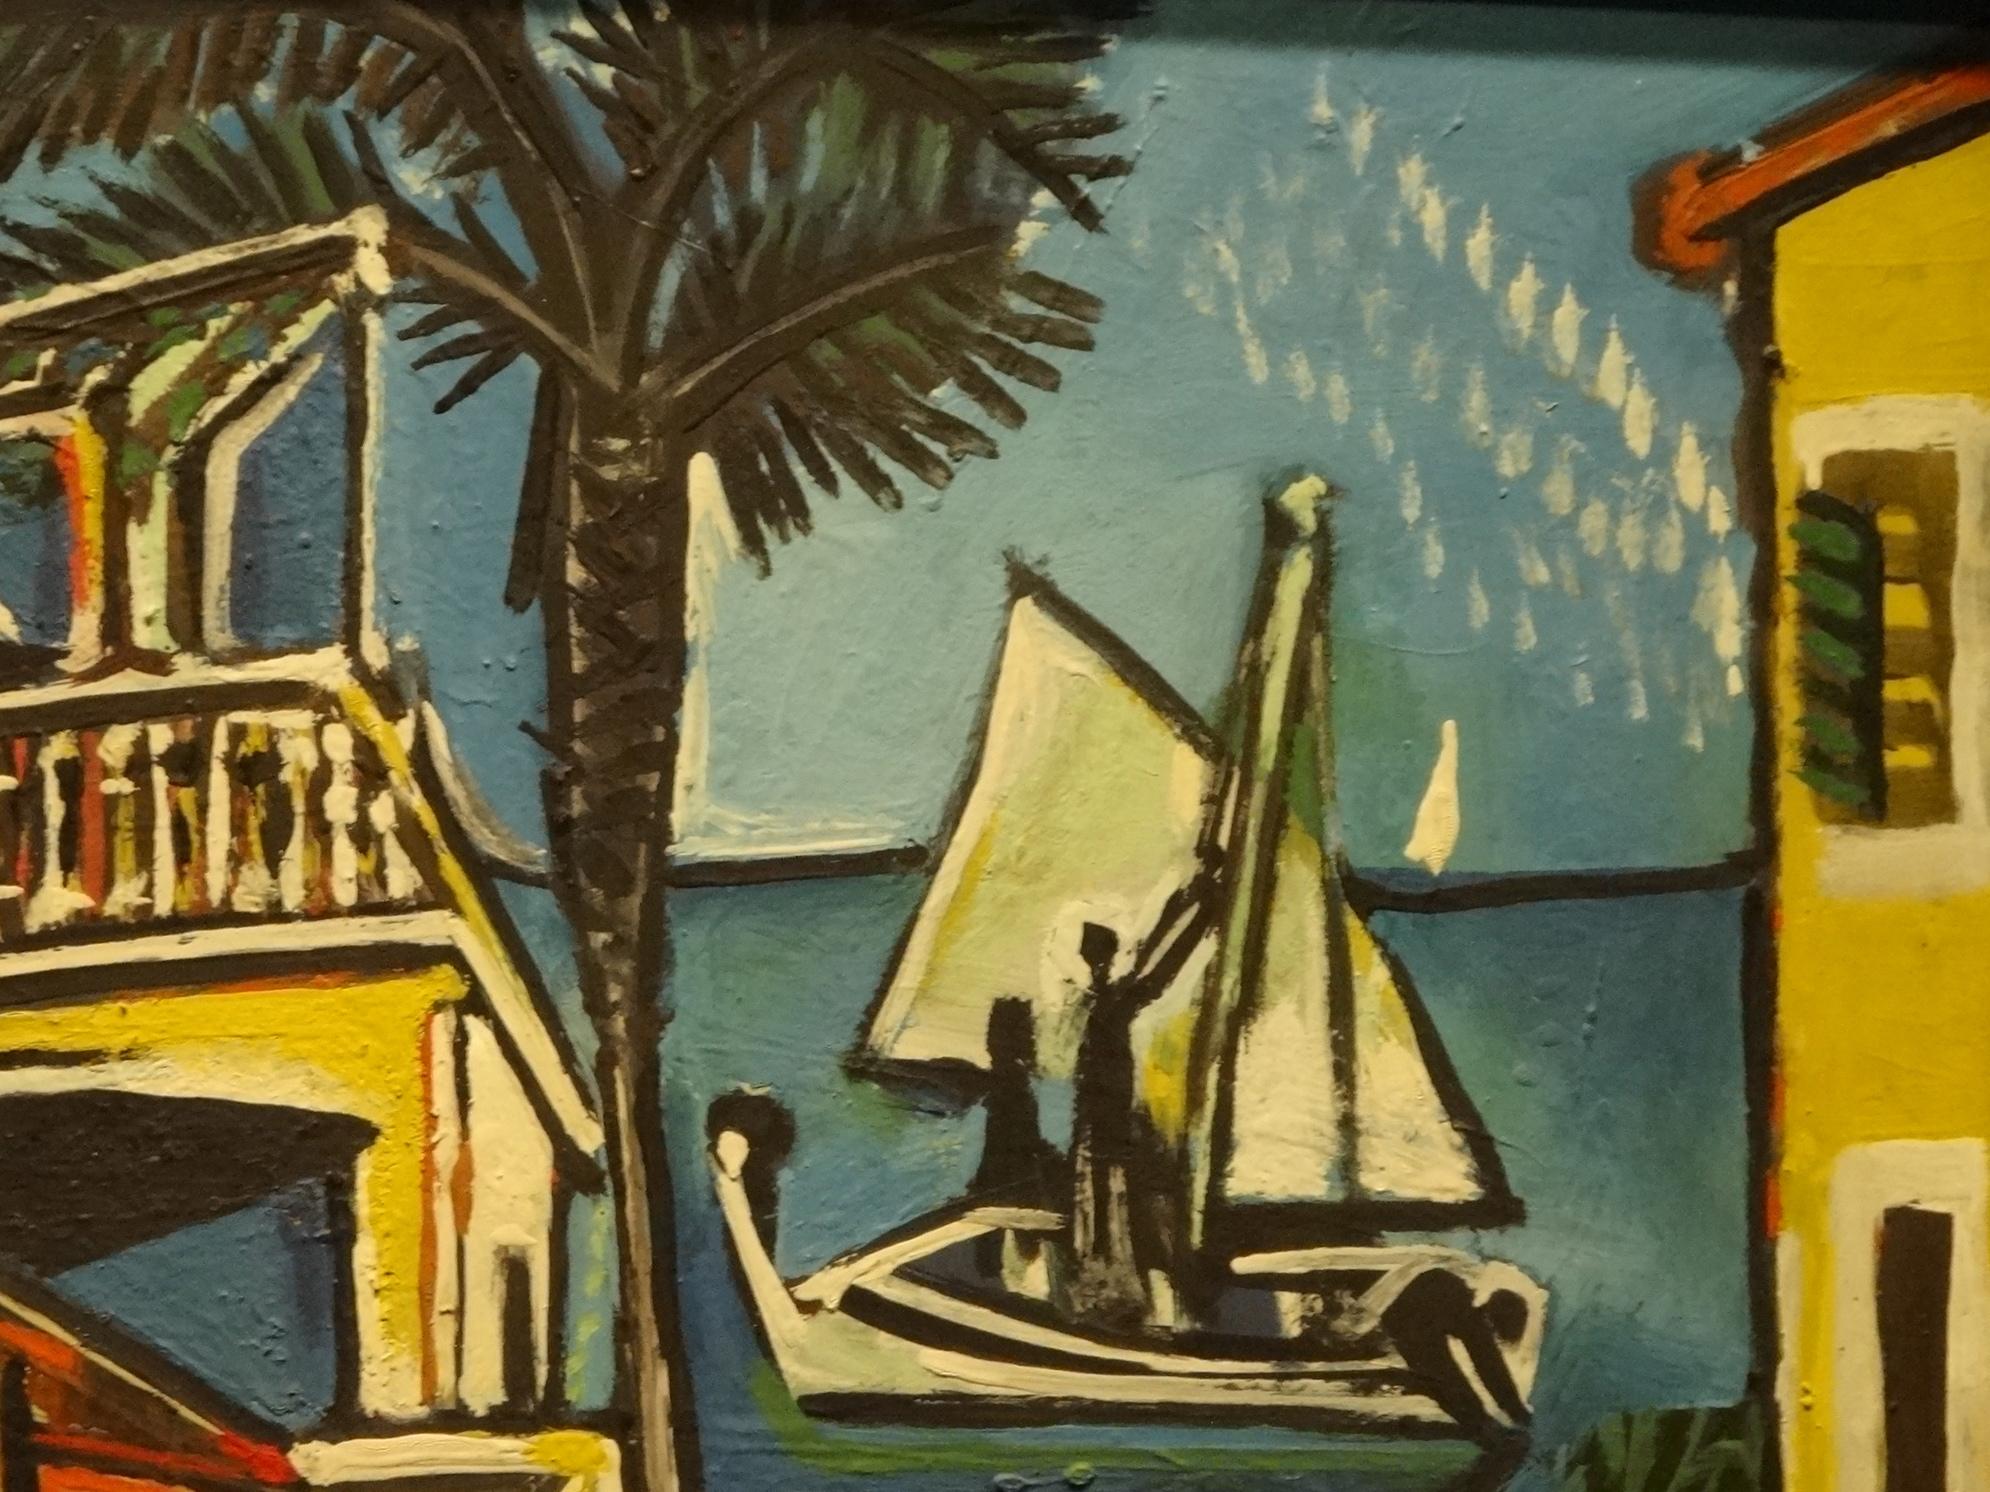 Albertina Details Picasso